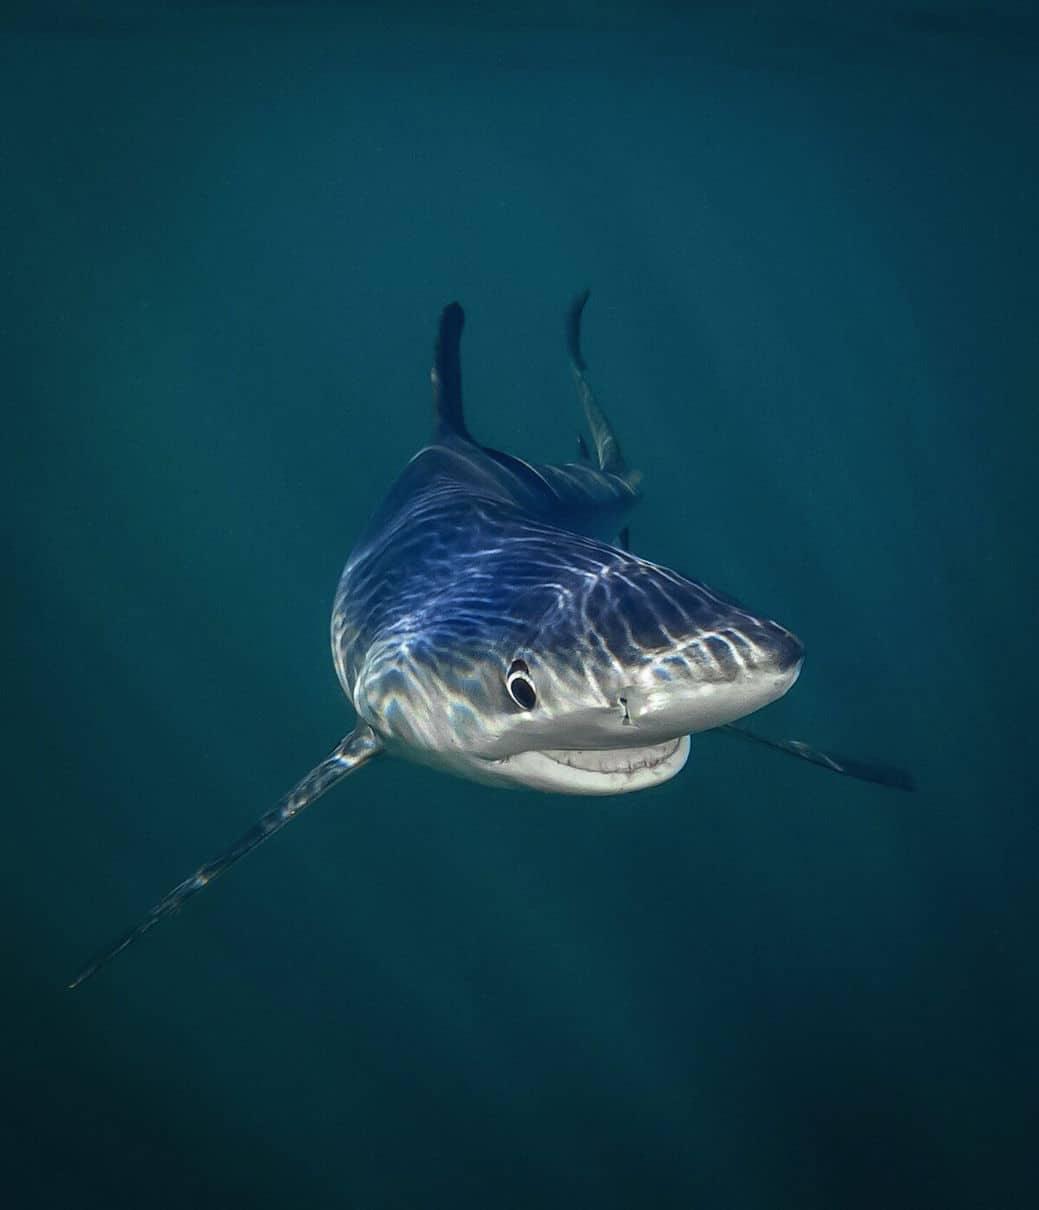 """Smiling Blue Shark"" autor Tanya Houppermans"